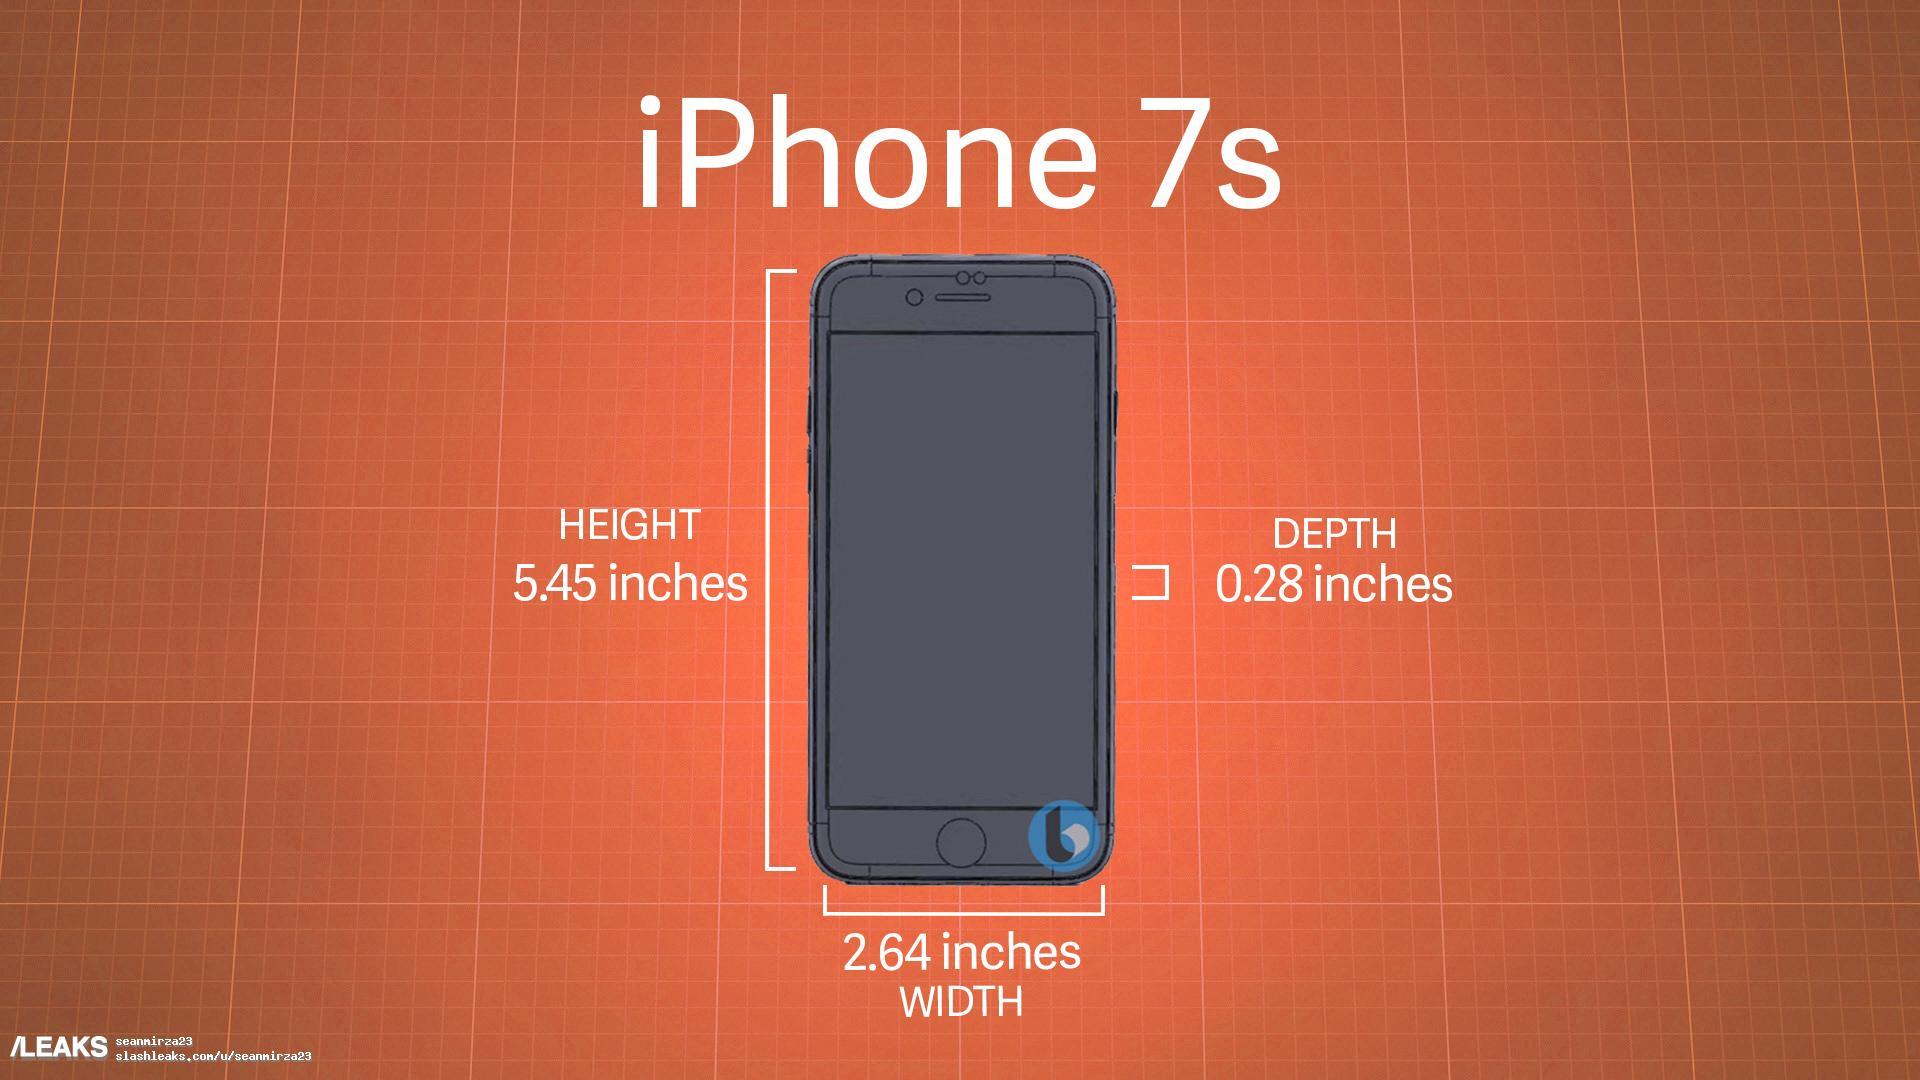 iphone_7s_blueprint-748.jpg